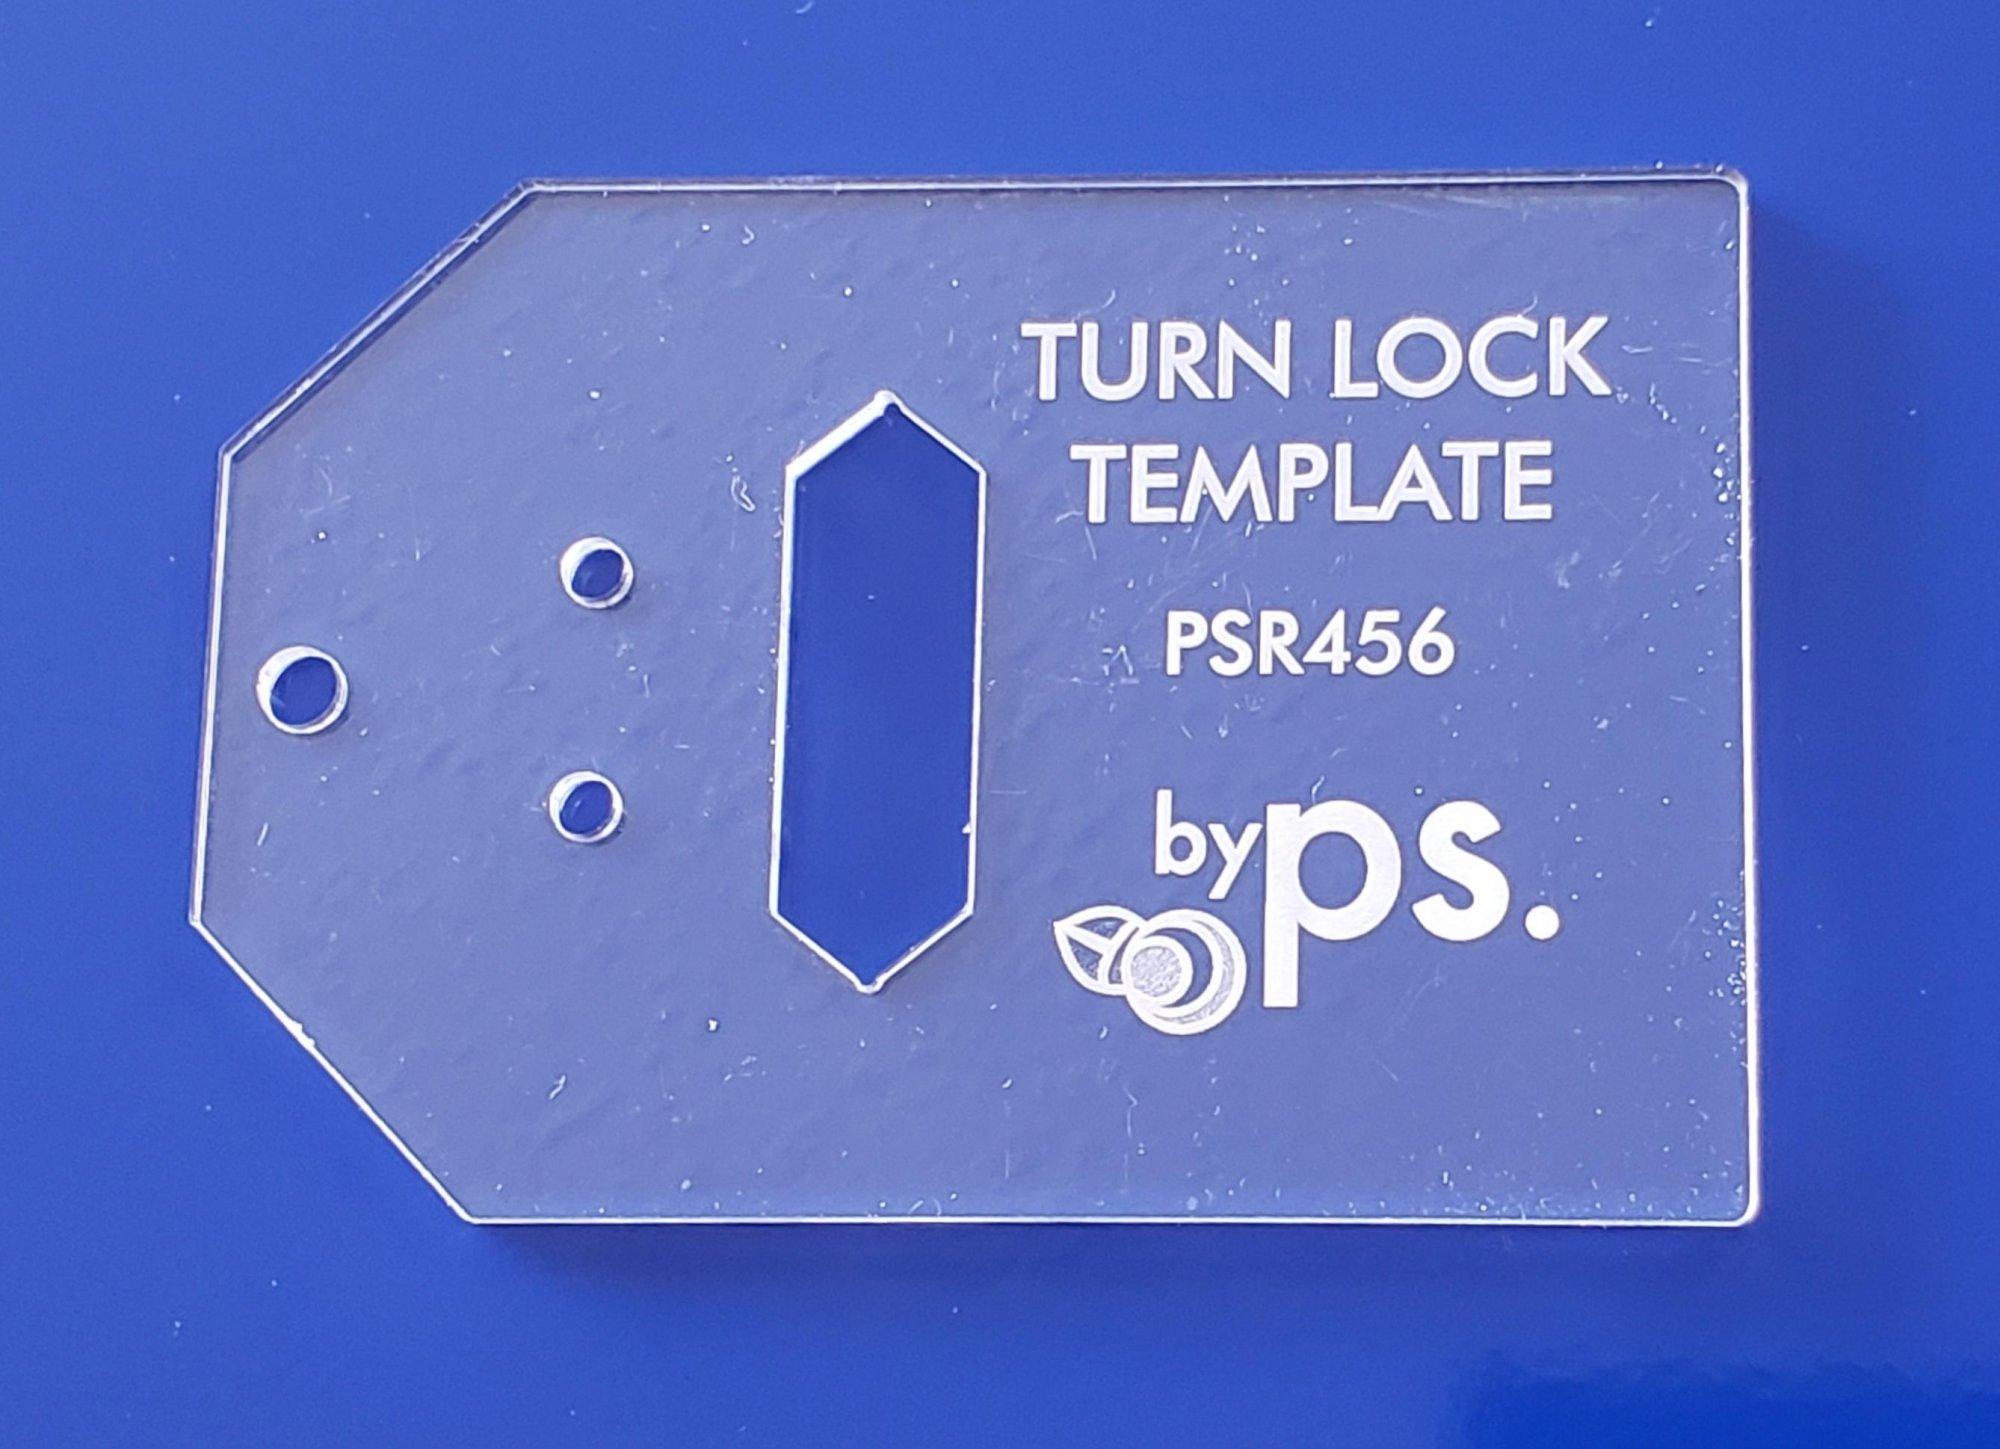 psr456 Turn Lock Template